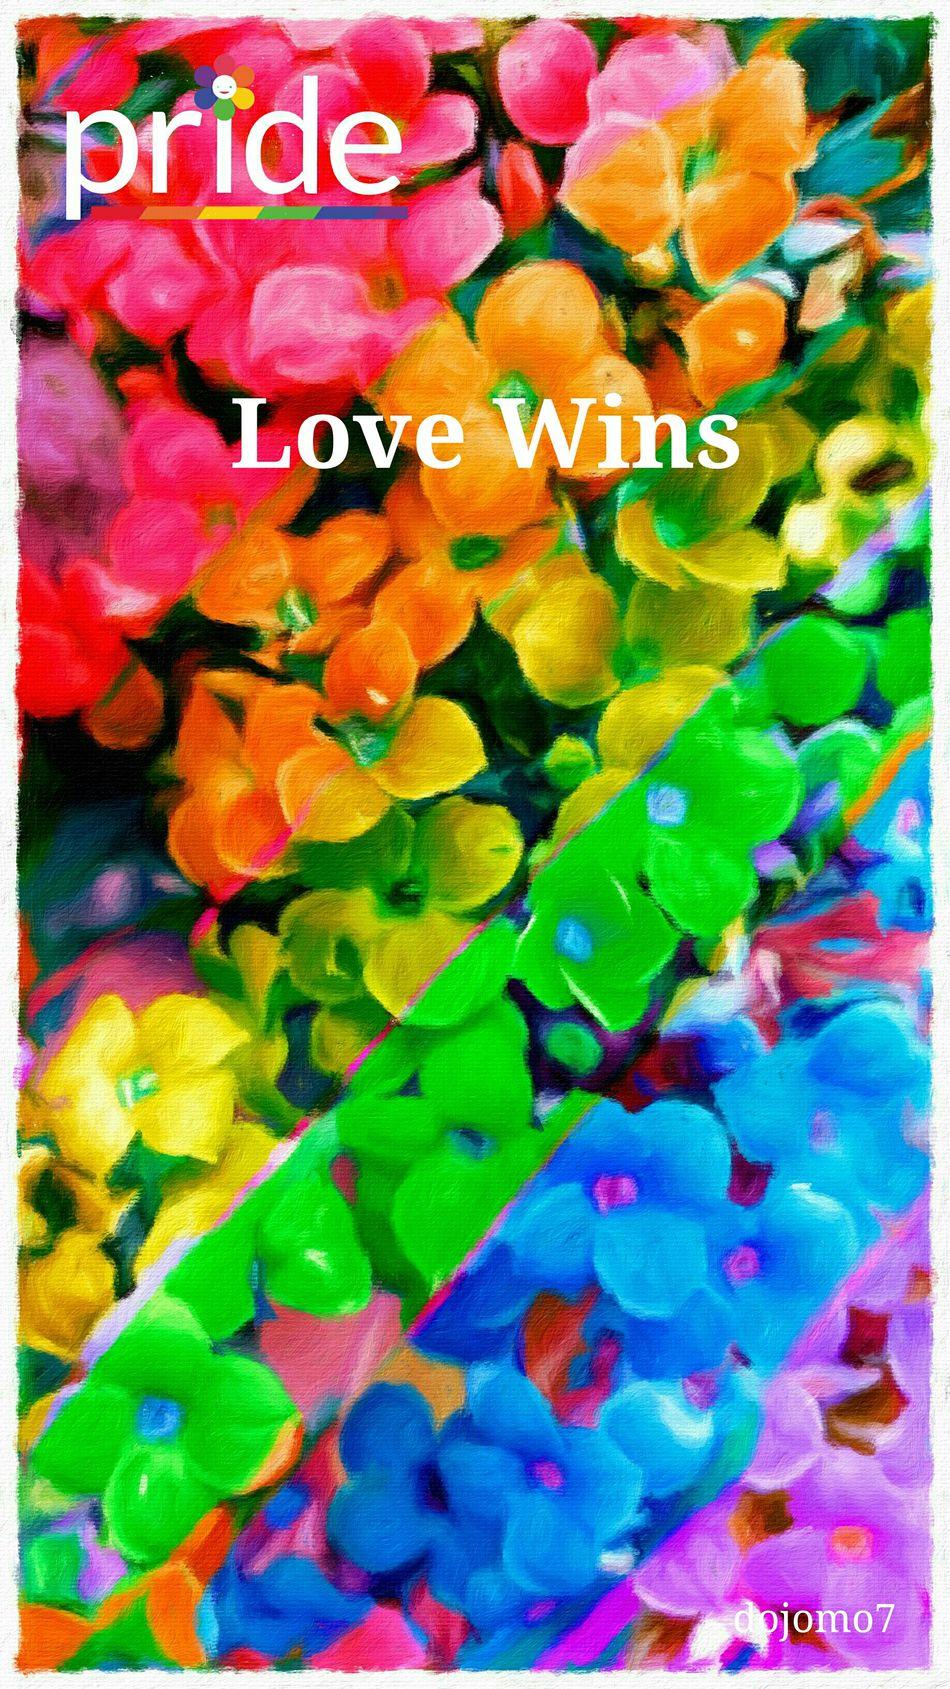 Love Wins Colorful Streamzoofamily Gay Pride Pride Love Wins